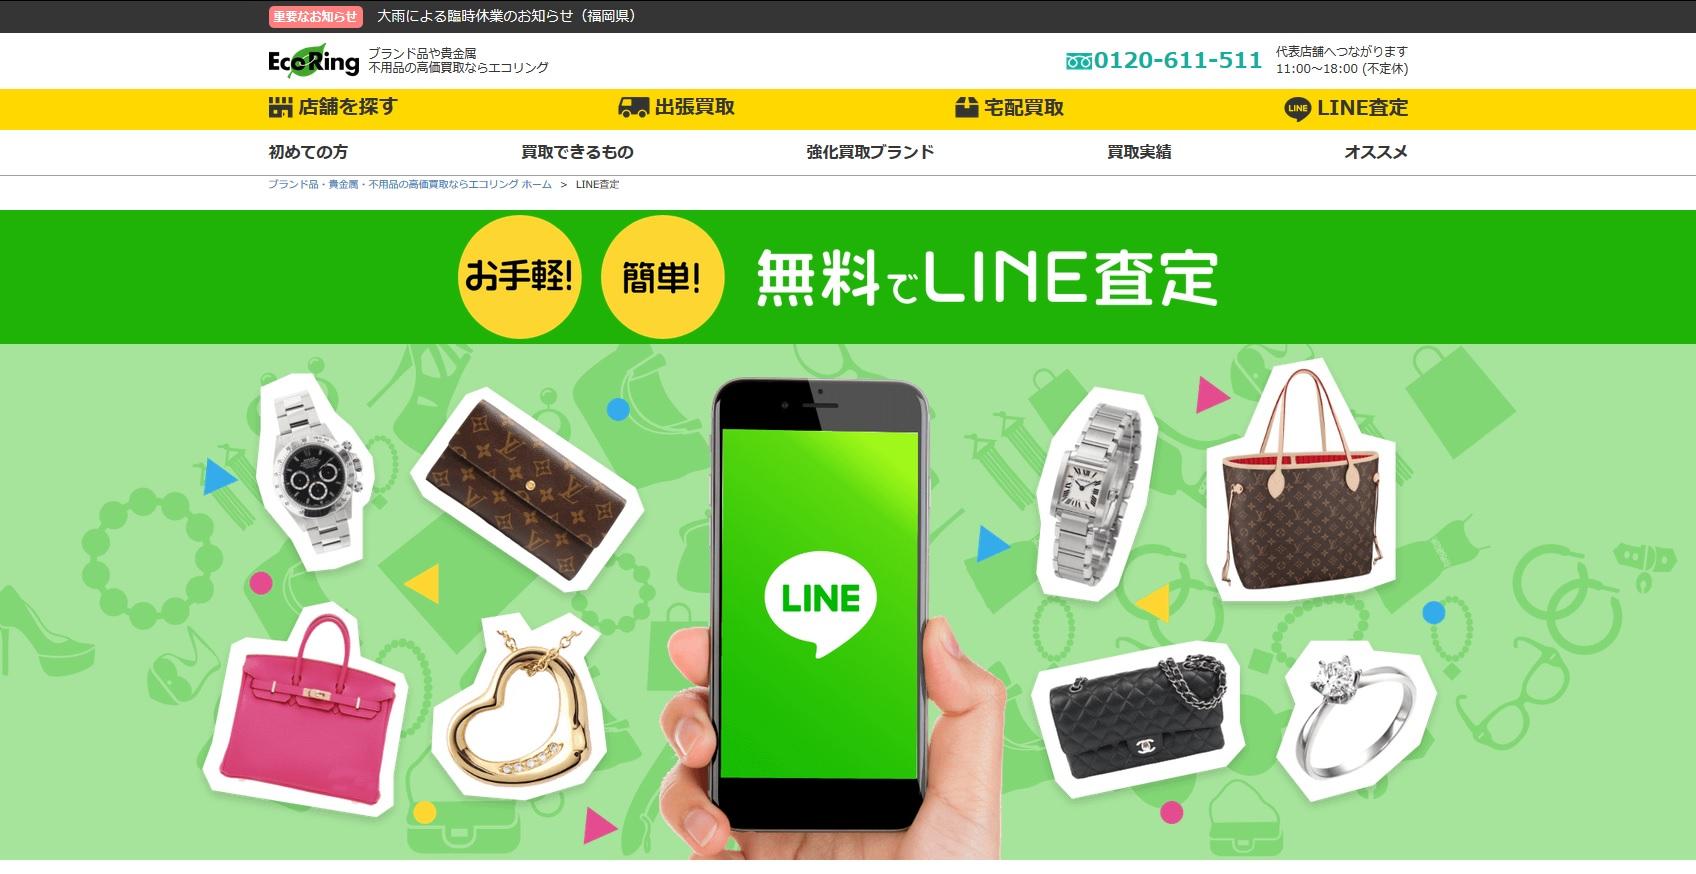 LINE査定 エコリング